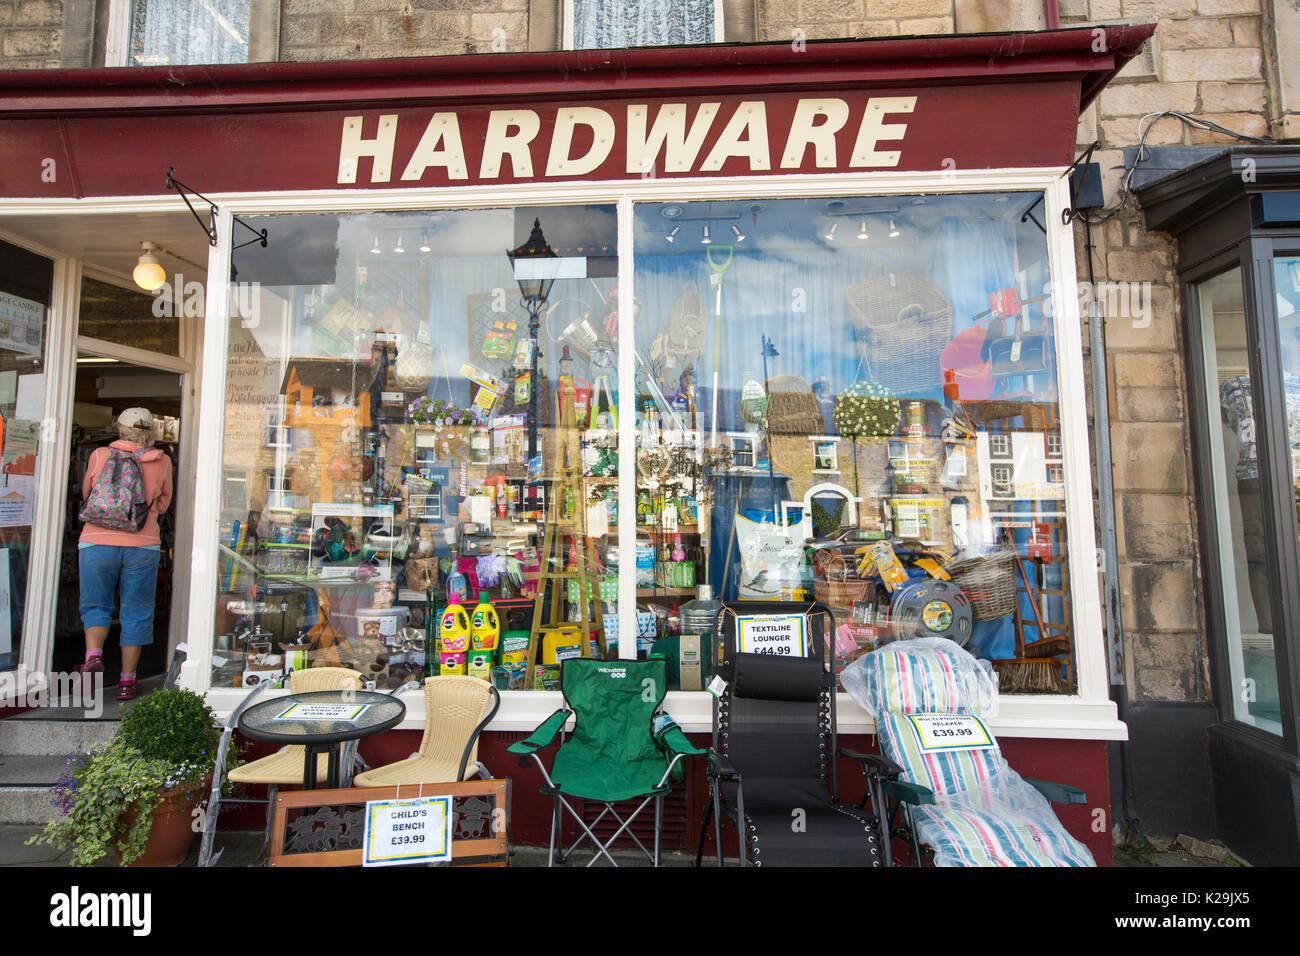 Window Display In Hardware Shop Stock Photos Amp Window Display In Hardware Shop Stock Images